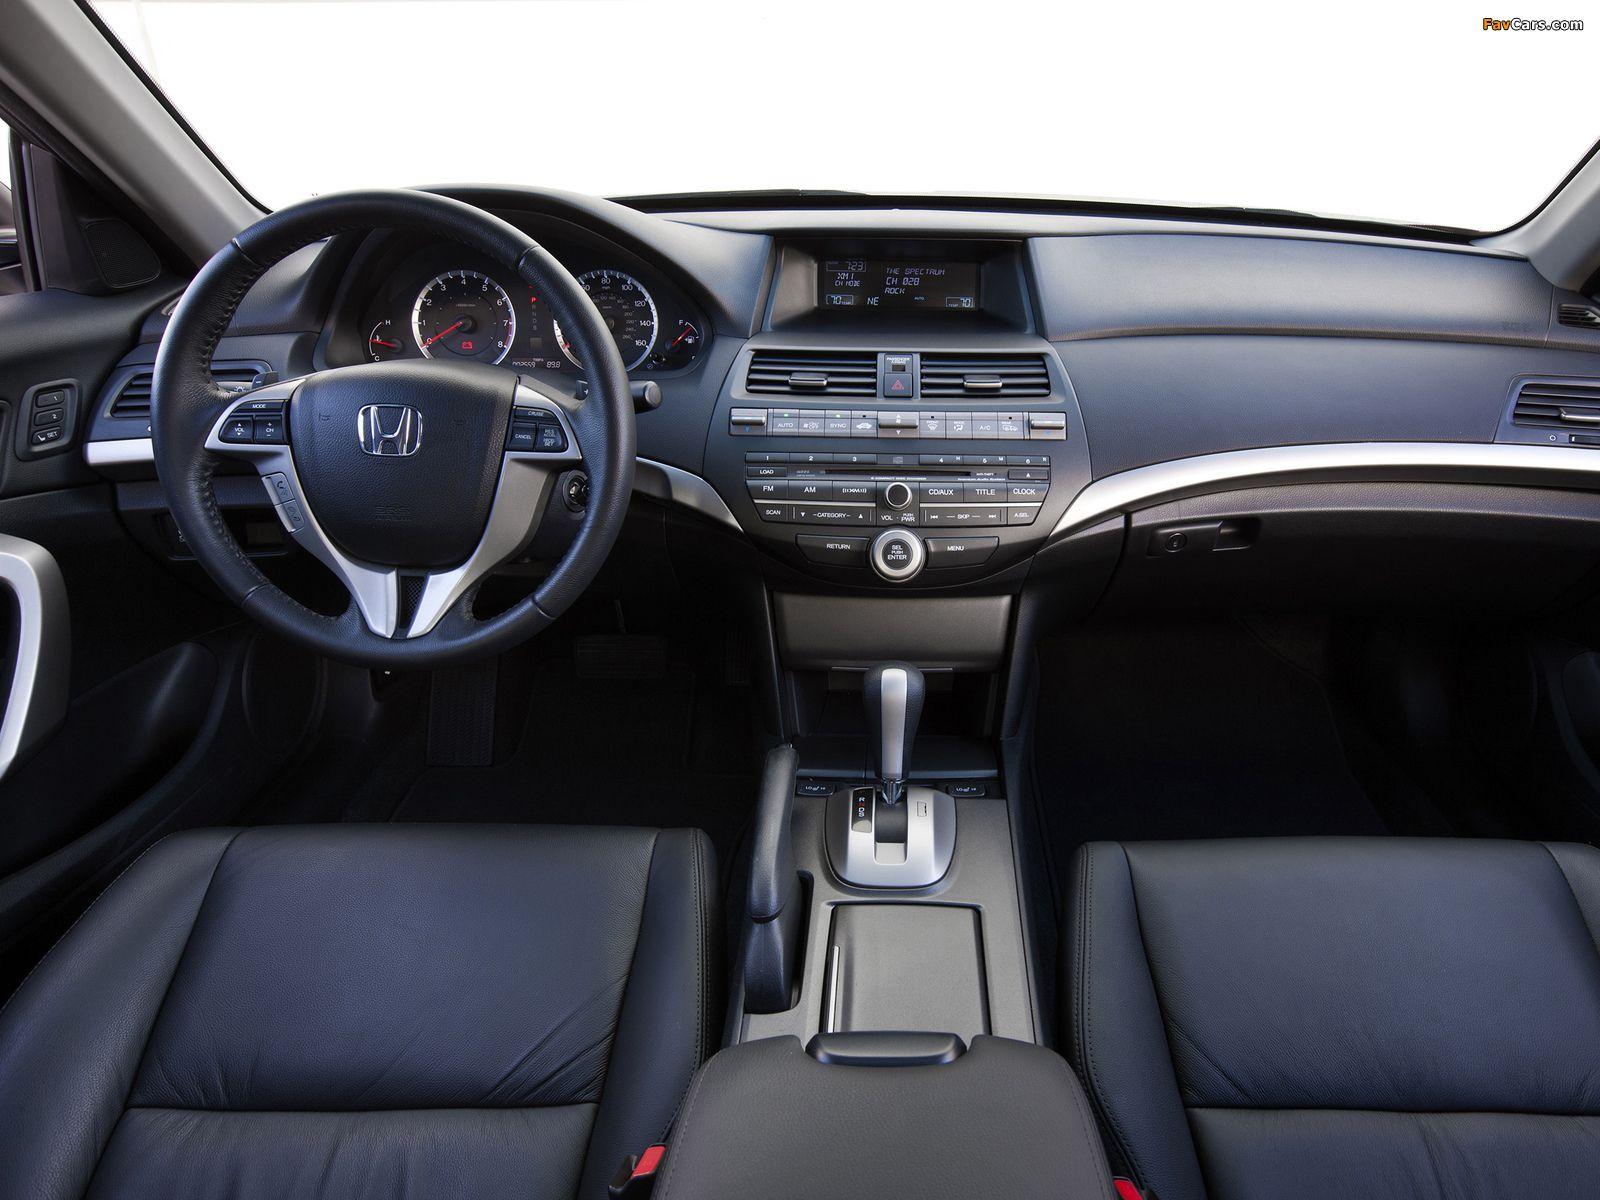 Honda Accord Coupe USspec 201012 Honda accord, Accord